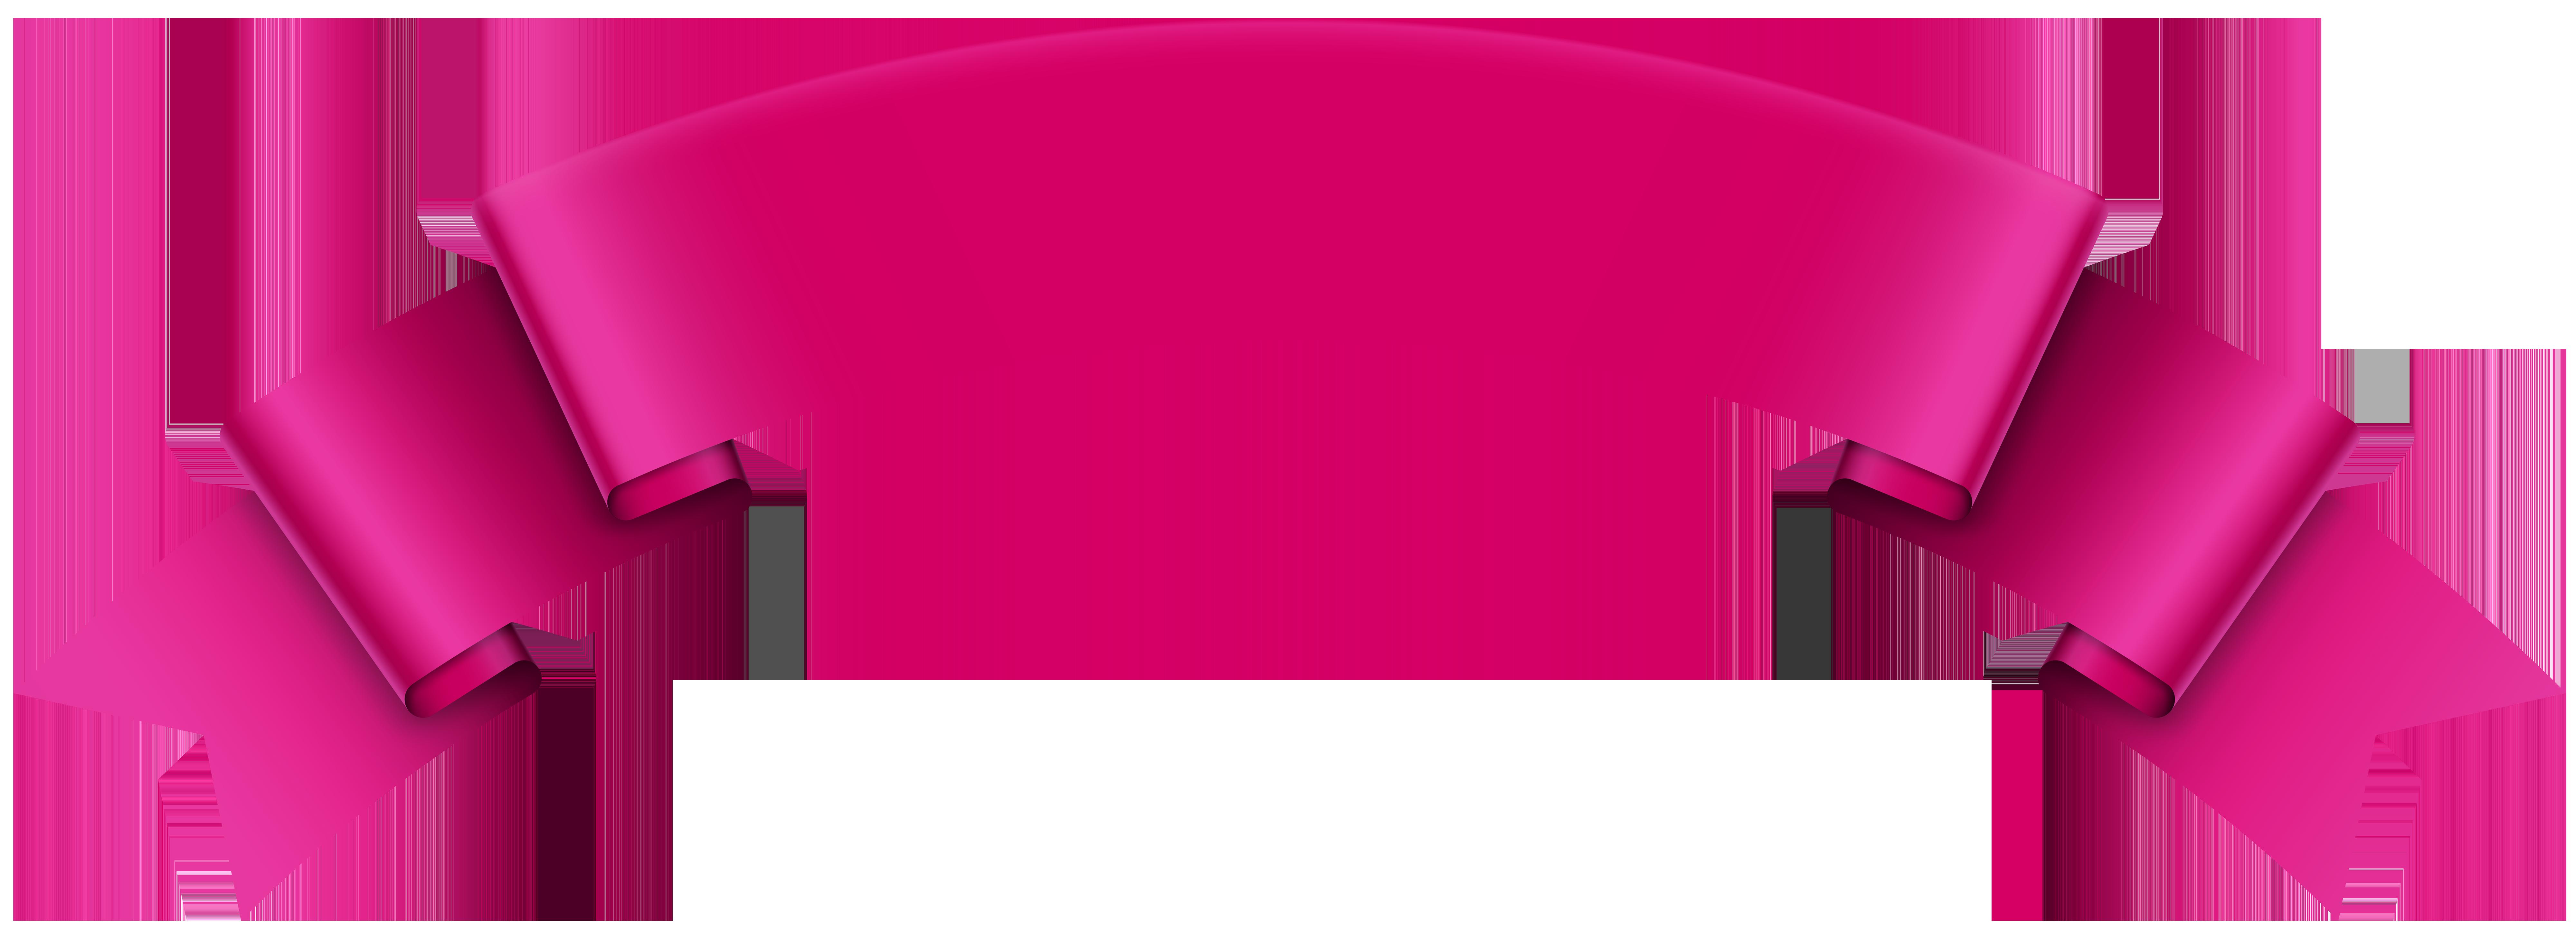 8000x2892 Banner Pink Transparent Png Clip Art Imageu200b Gallery Yopriceville